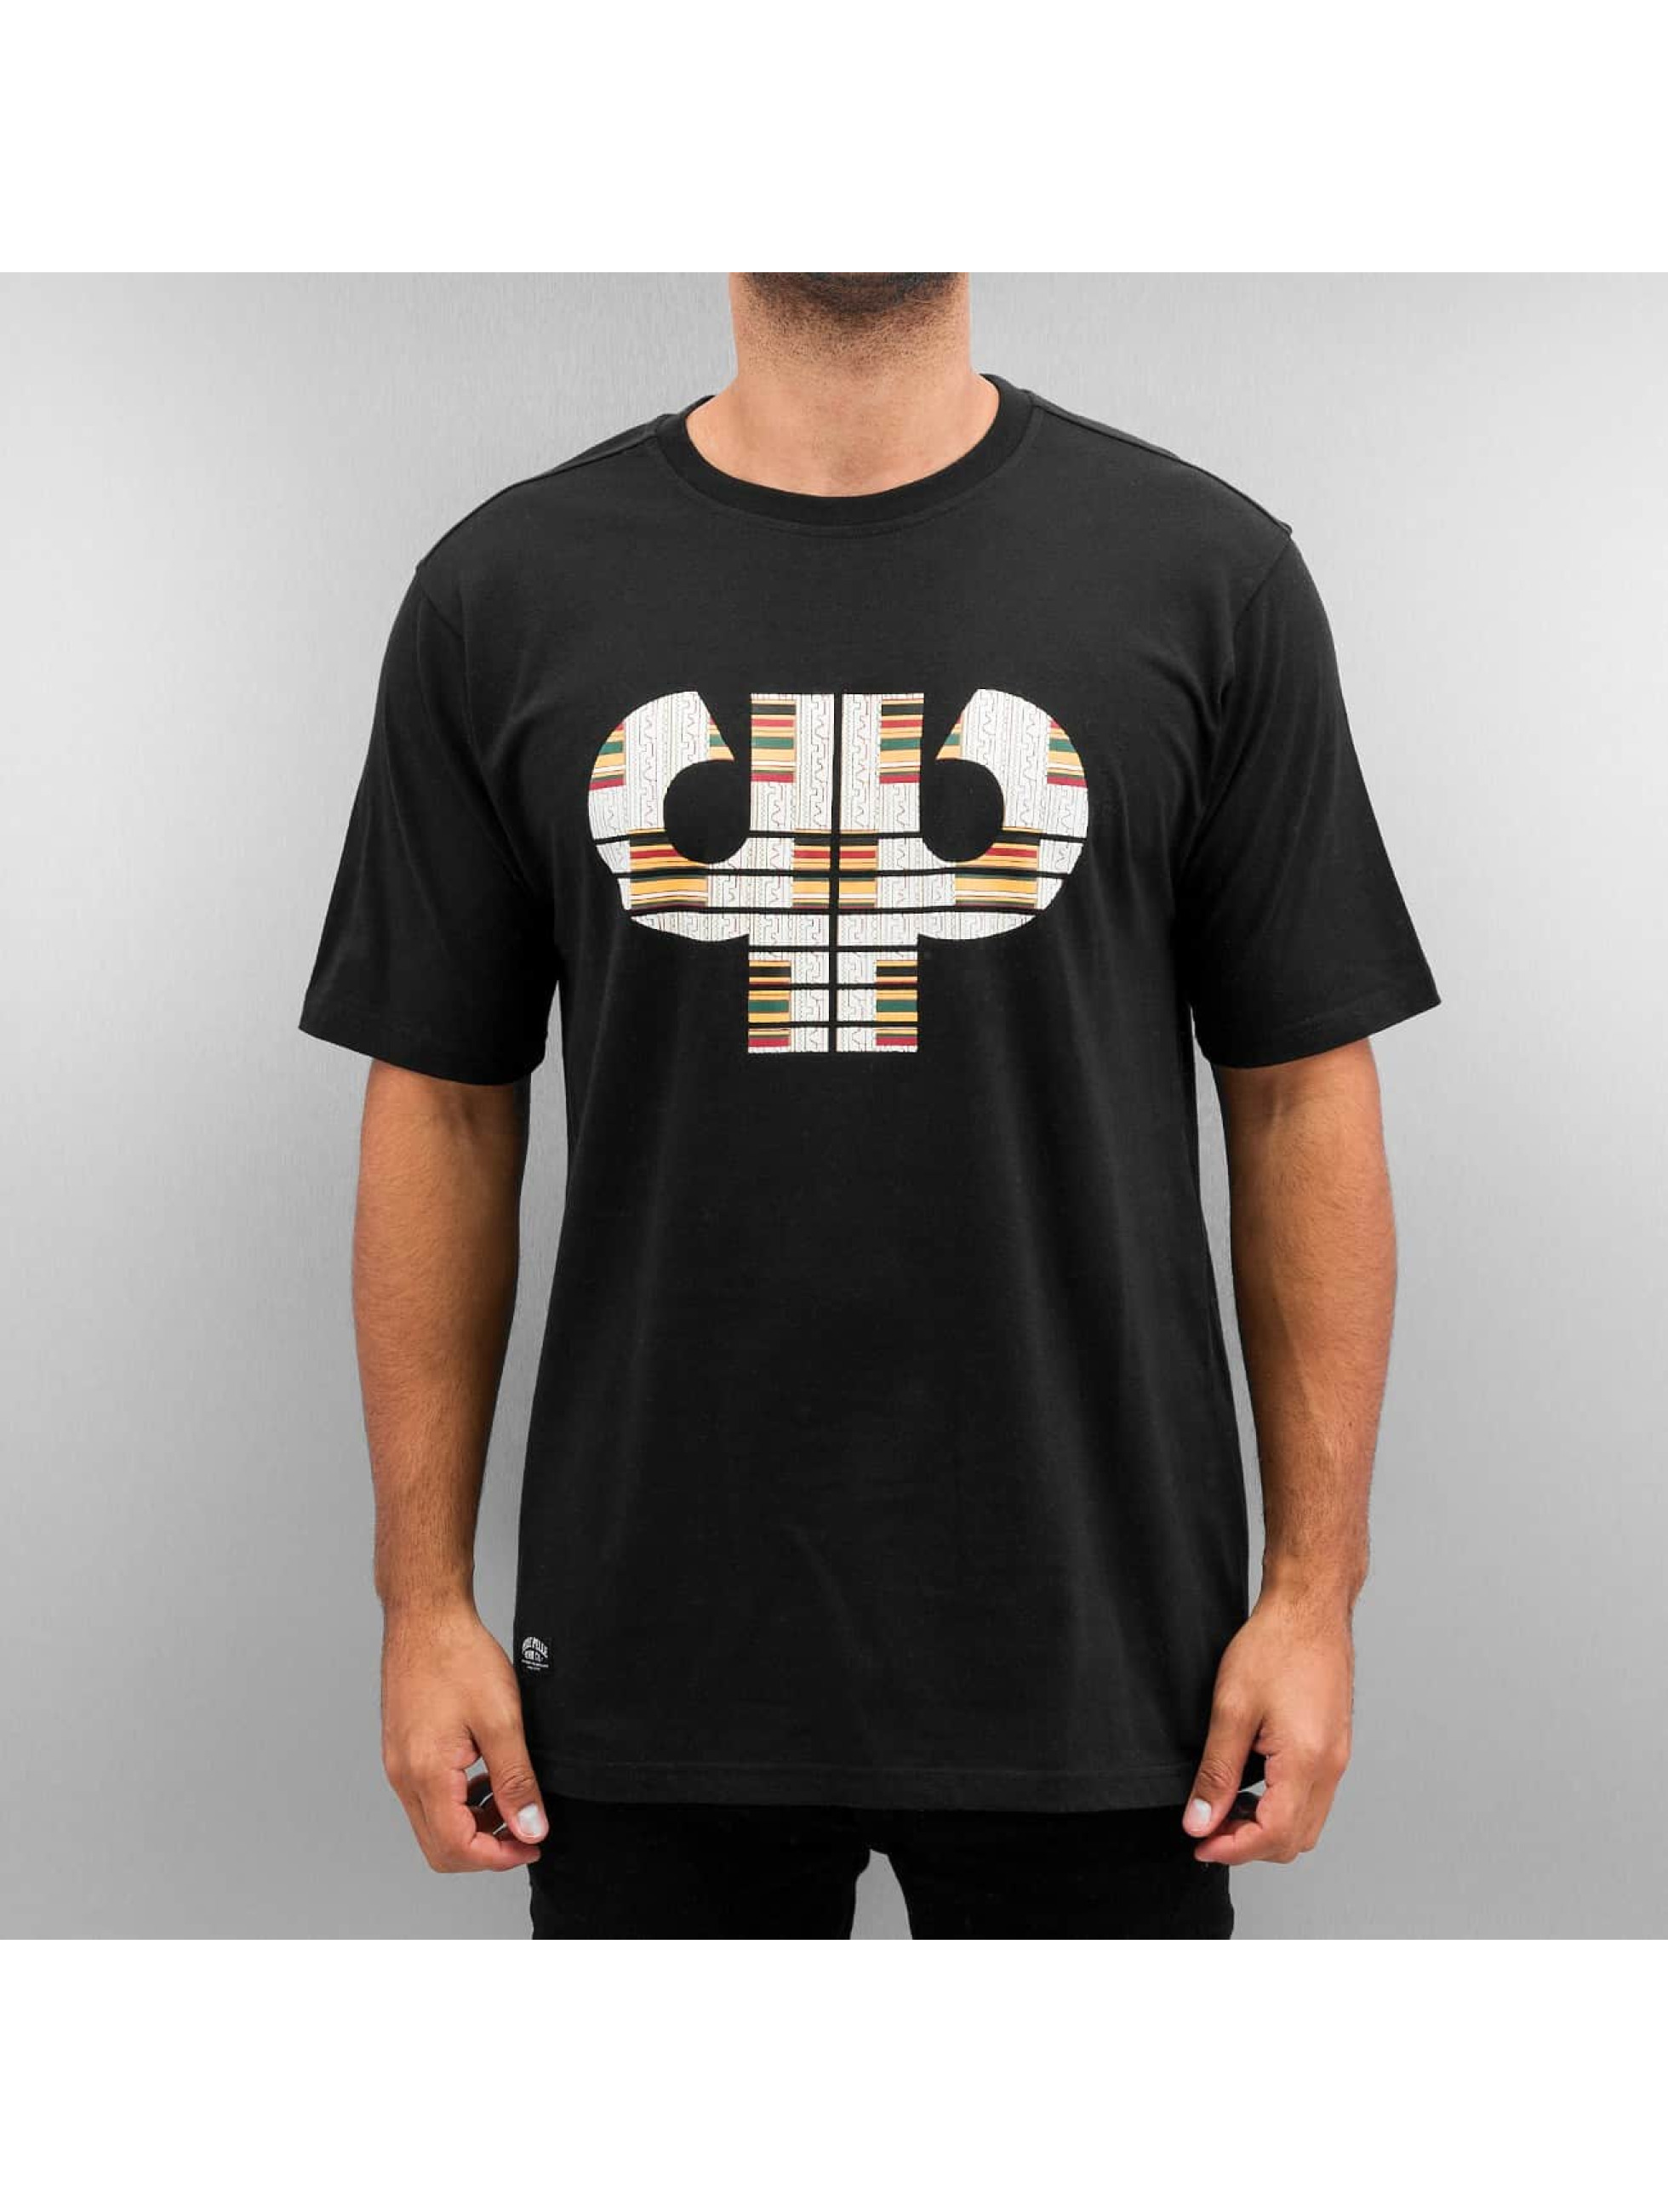 Pelle Pelle T-shirts Fresh Icon sort